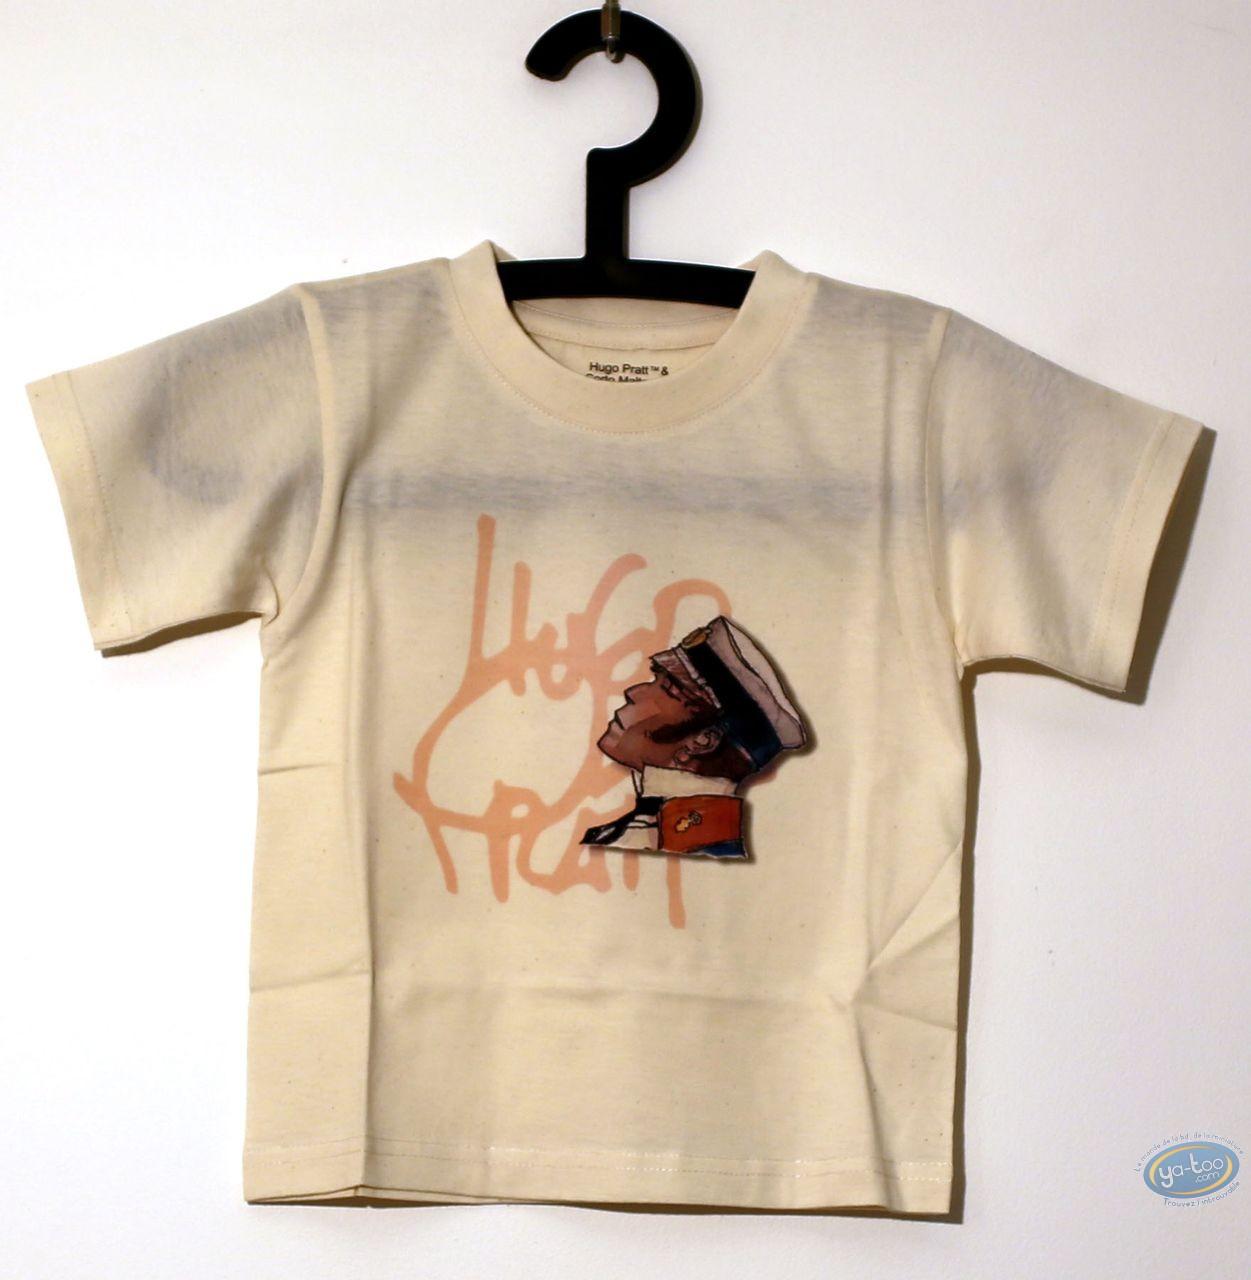 Clothes, Corto Maltese : T-shirt, Corto Maltese : Kid 02/02 - 7/8 years